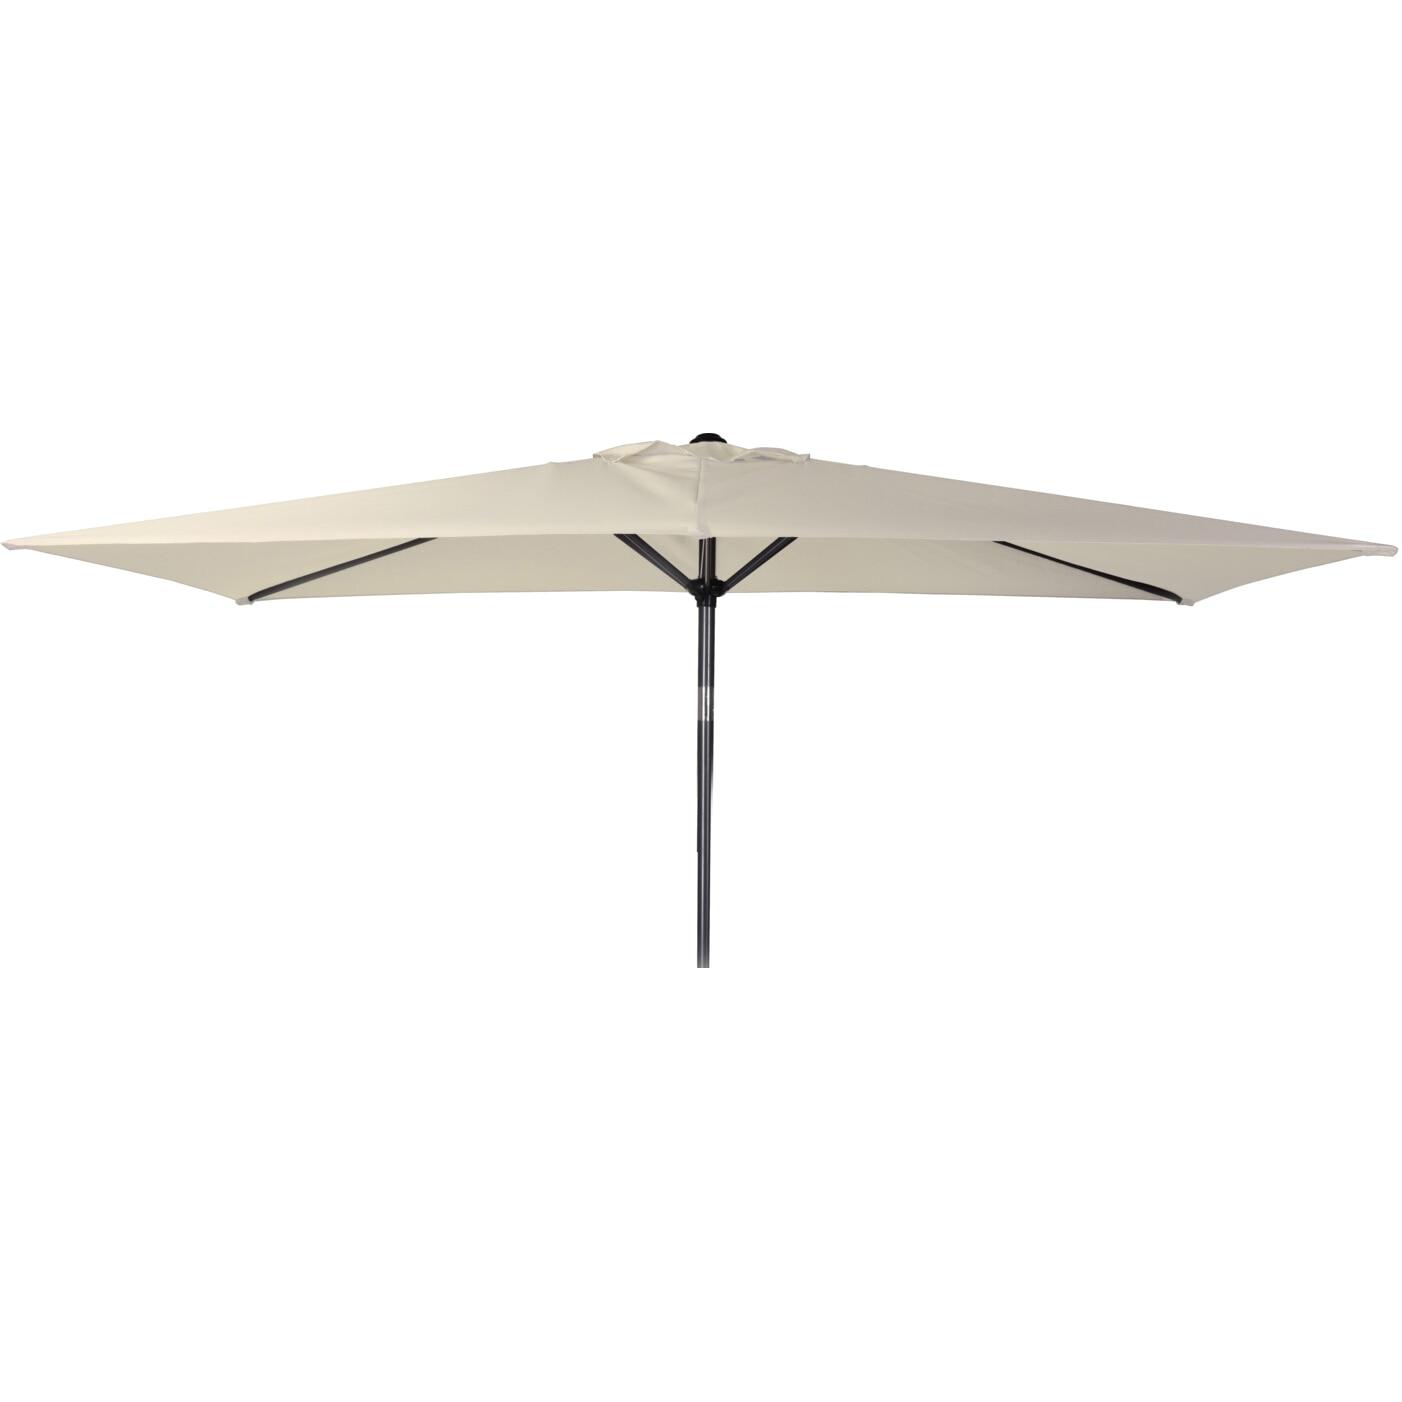 Fotografie Umbrela de soare Ambiance, 150x250cm, poliester 180 g/mp, crem